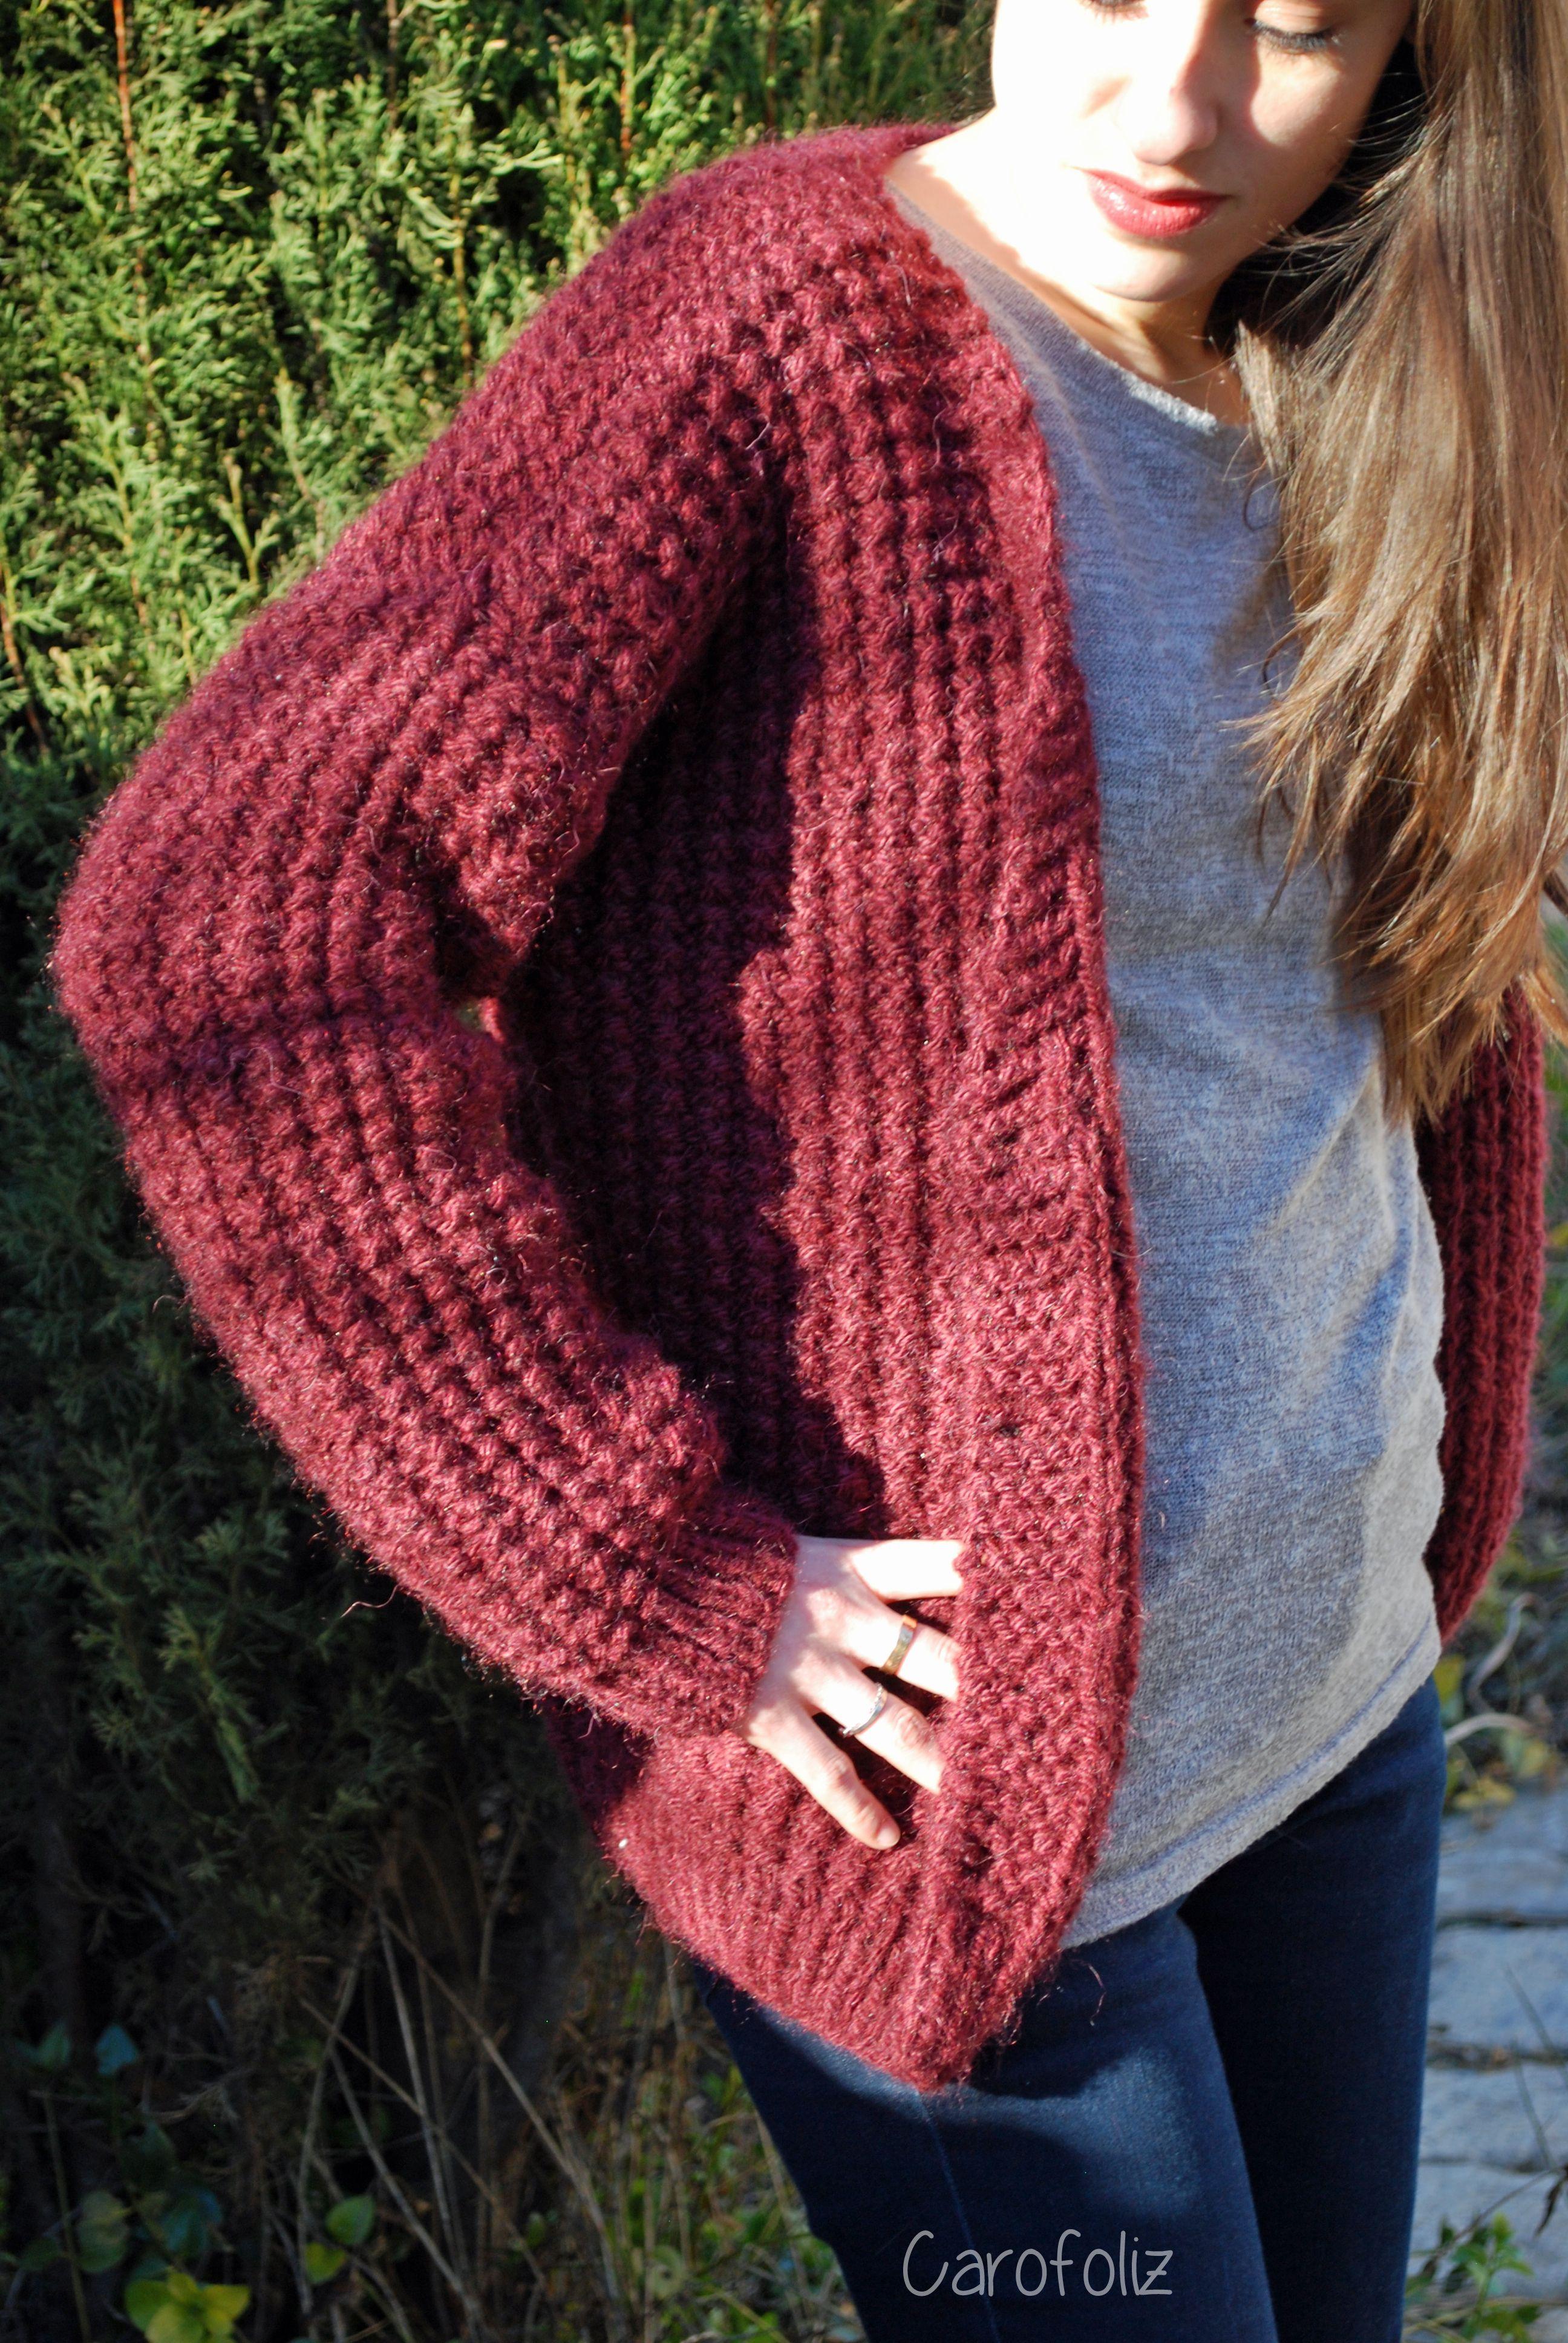 gros gilet loose au tricot   vetements   Pinterest   Knitting ... 89062bbc520